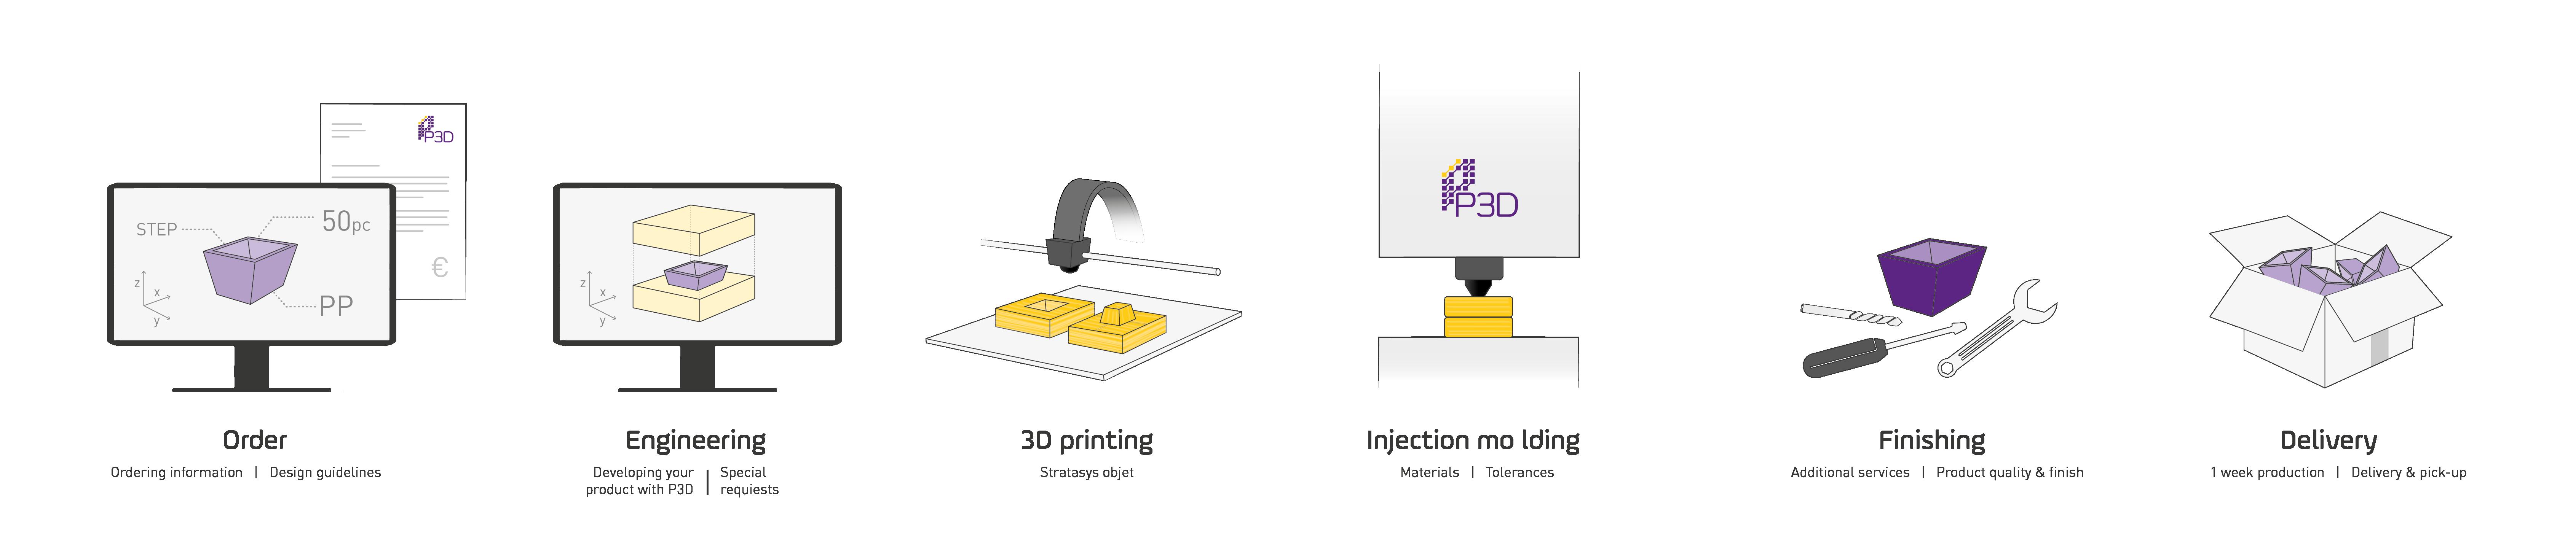 P3D – P3D-PRIM Promolding 3D printing